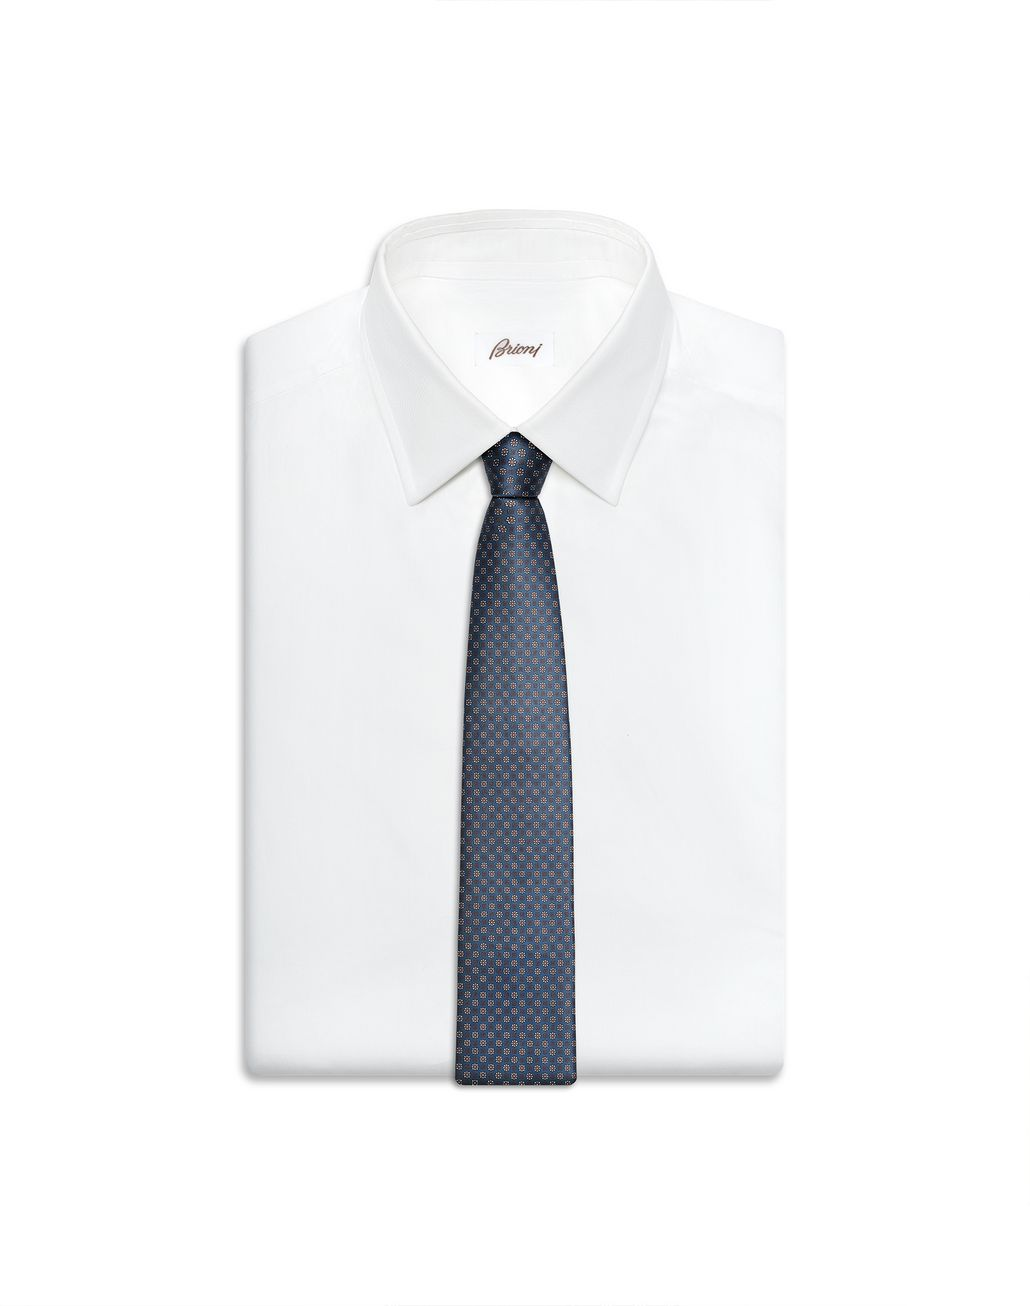 BRIONI Blaue Krawatte mit Micro-Muster Krawatte [*** pickupInStoreShippingNotGuaranteed_info ***] e